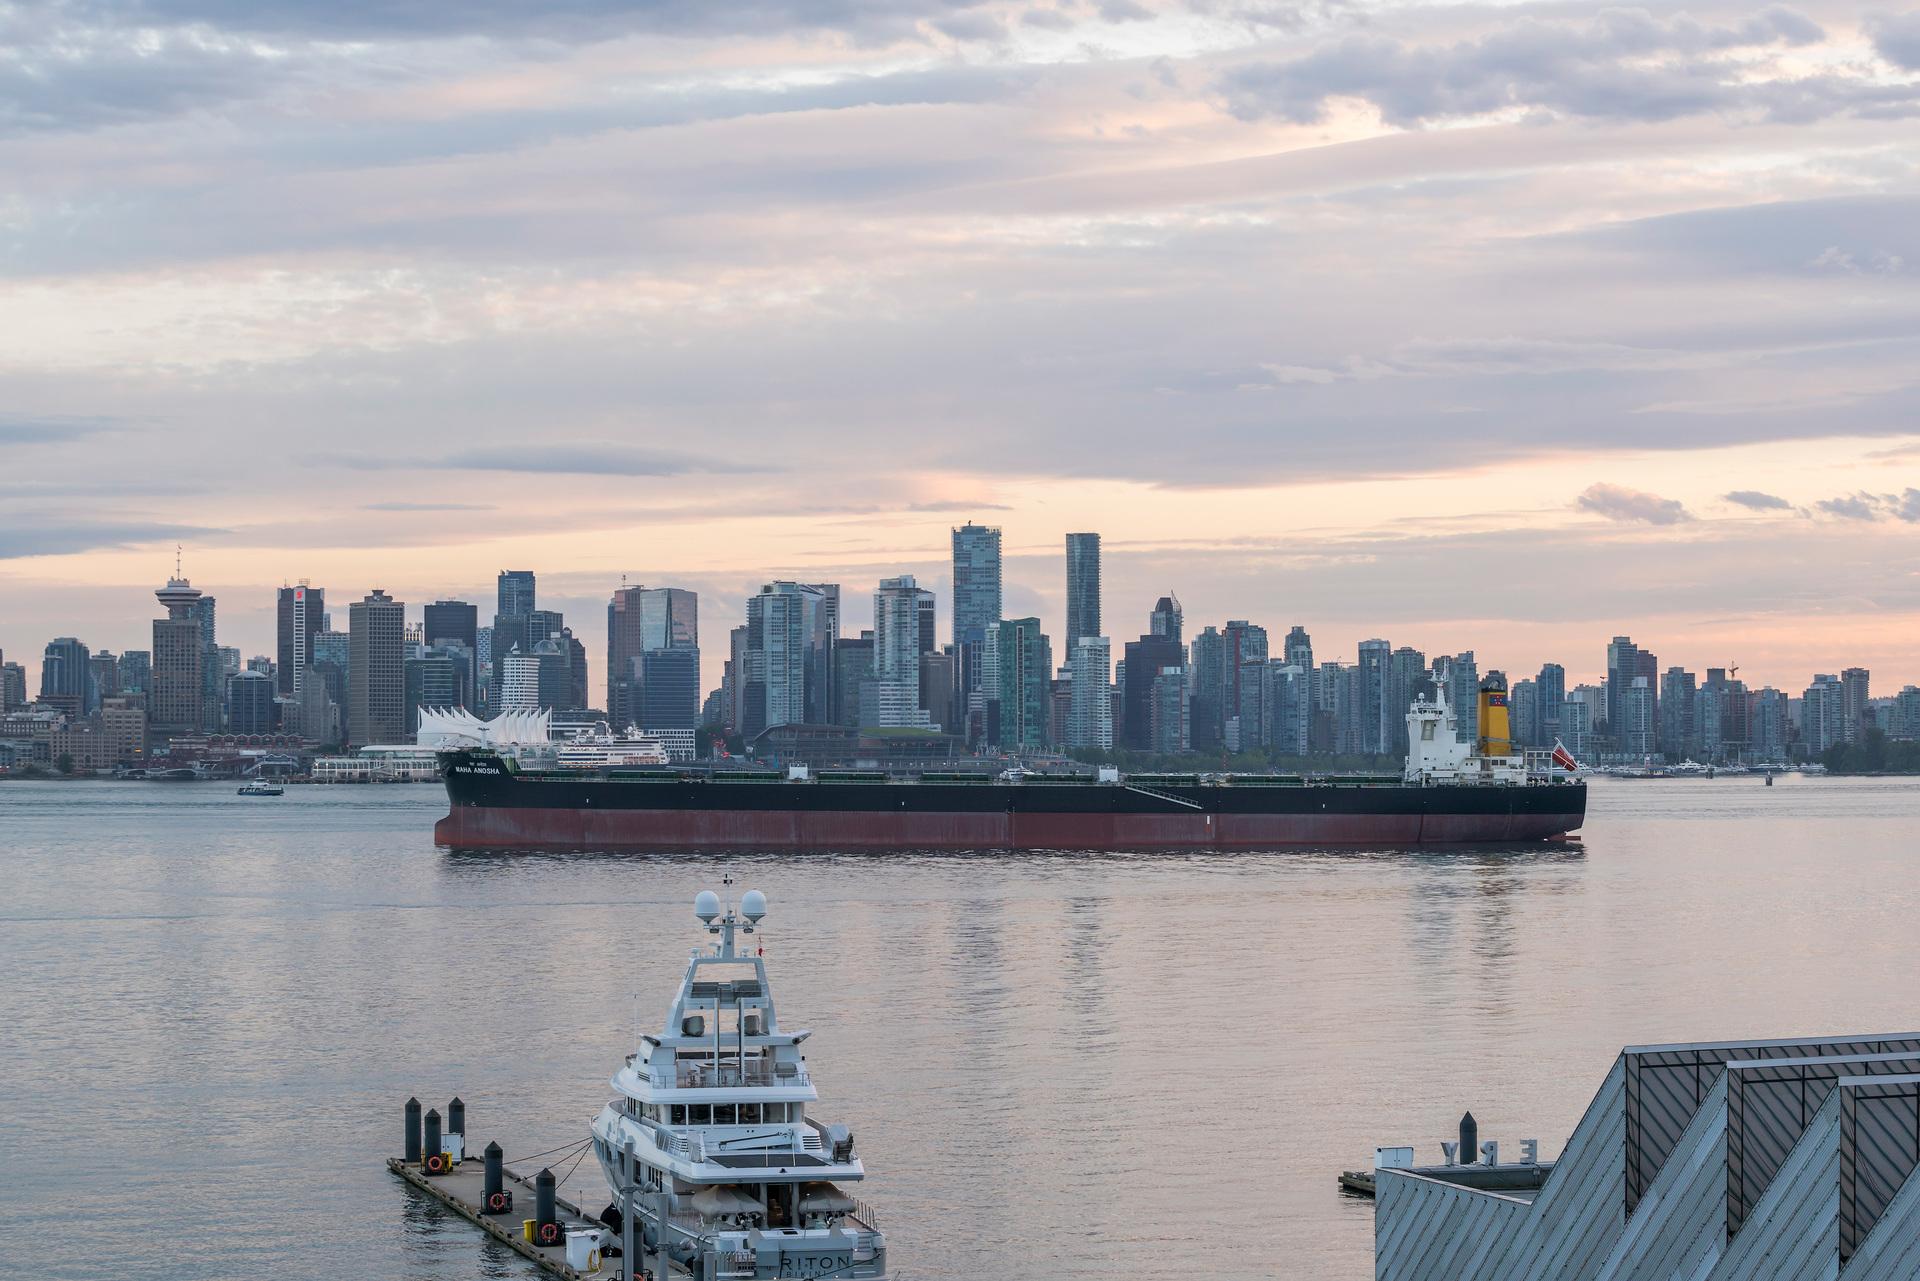 503-133-e-esplanade-ave-360hometours-25 at 503 - 133 E Esplanade, Lower Lonsdale, North Vancouver